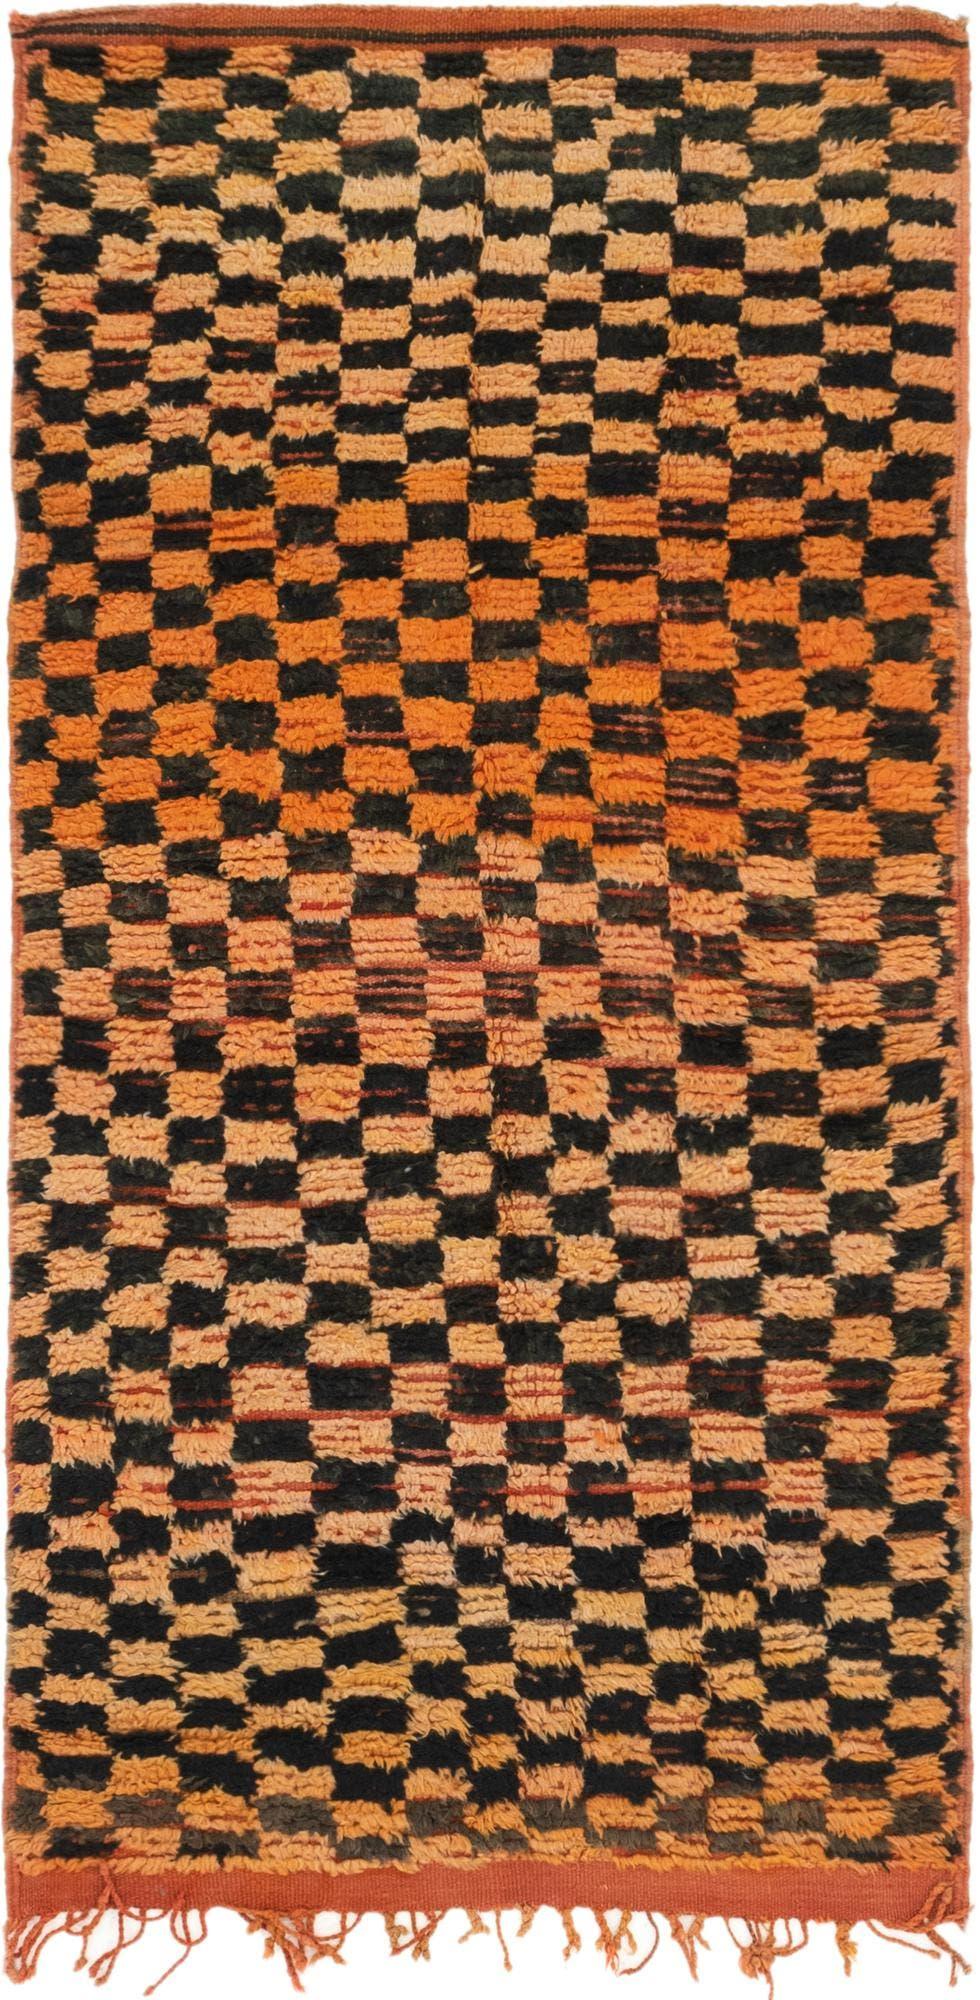 3' 6 x 6' 10 Moroccan Rug main image